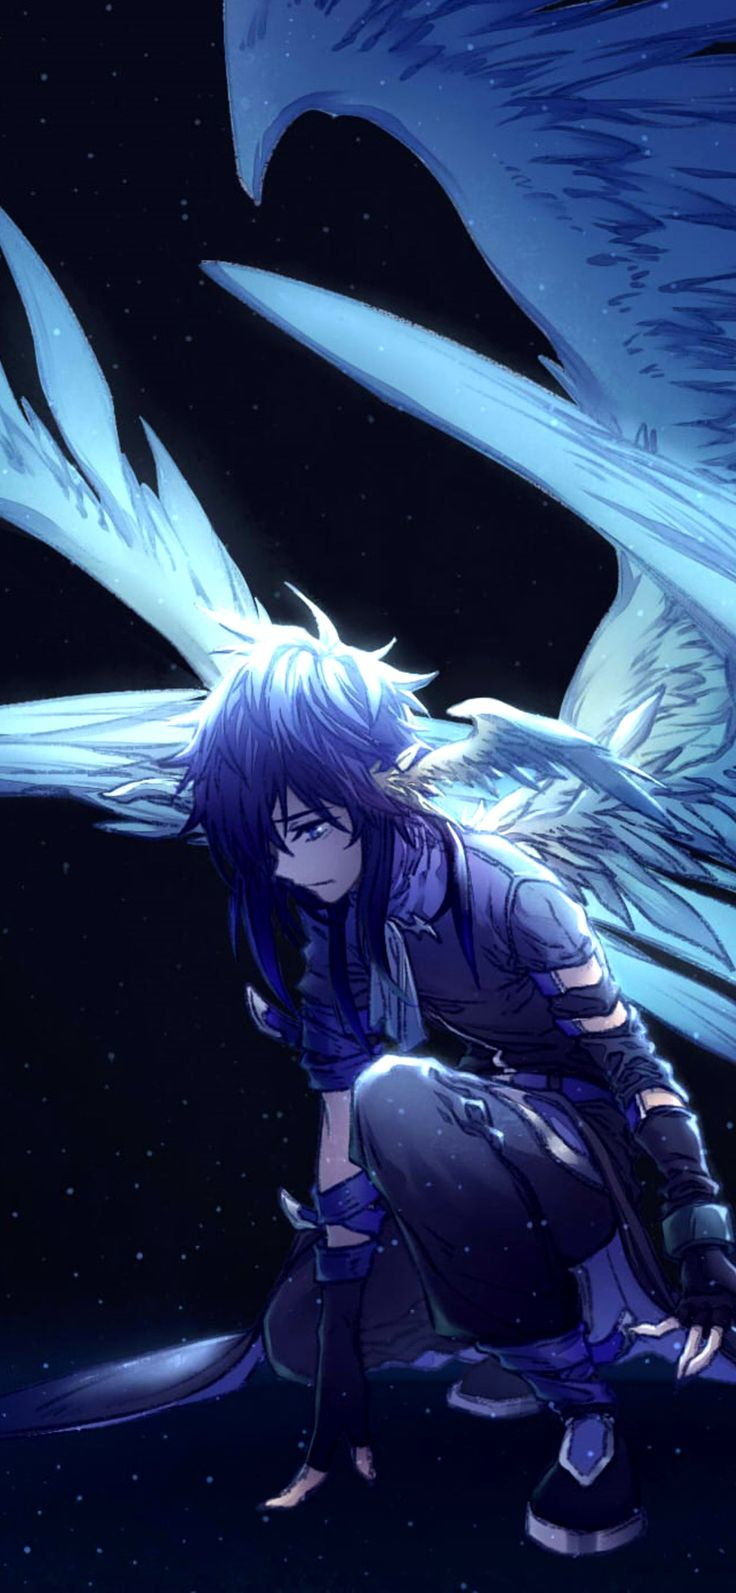 Wallpaper 4K Anime Iphone X Gallery Gambar anime, Sedih